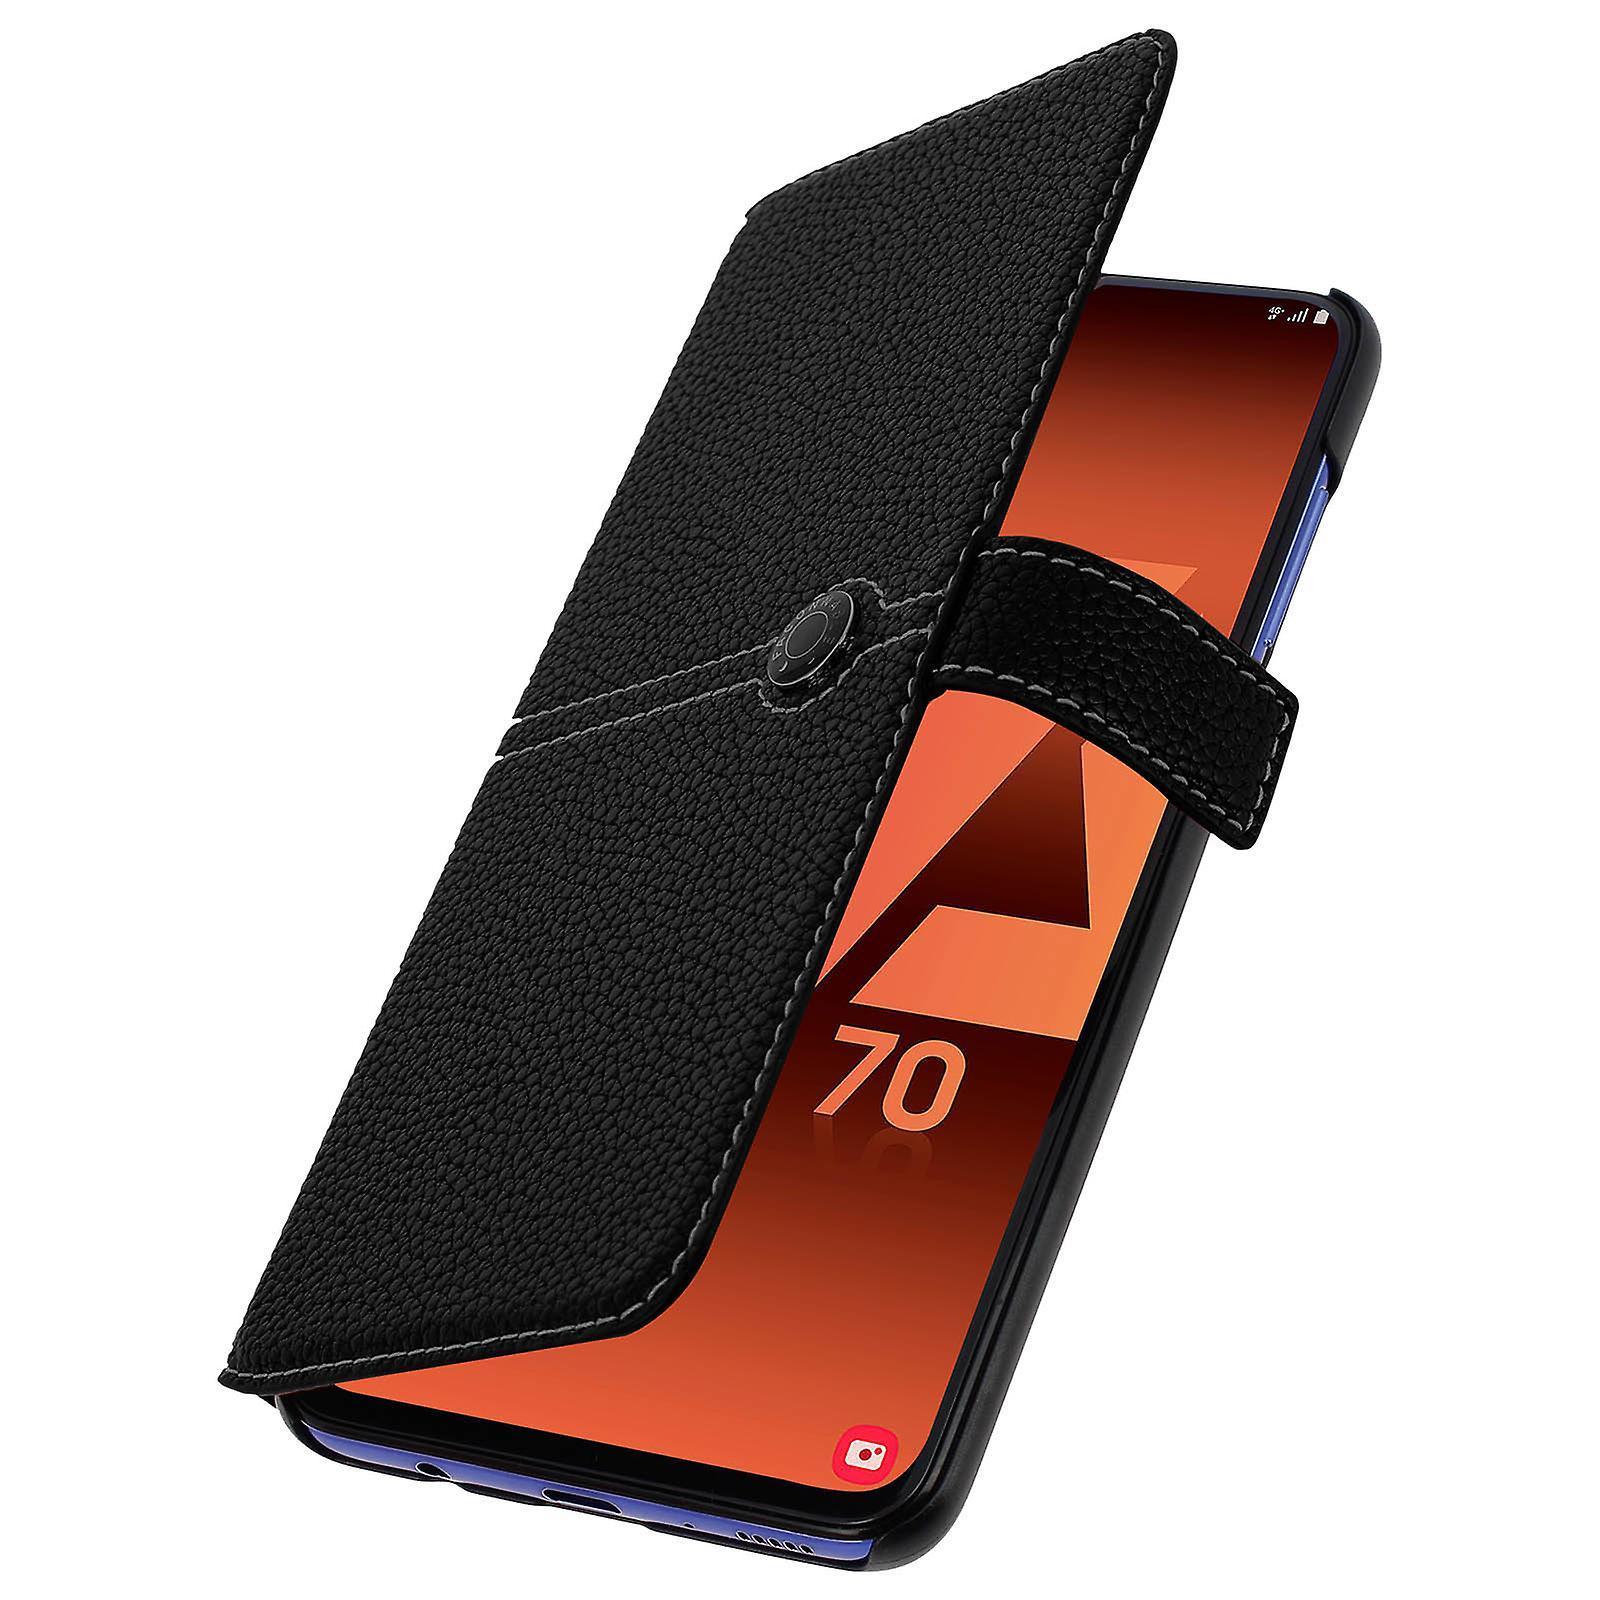 Etui de protection pour Samsung Galaxy A70 - FAGXA70BKBL100 - Noir